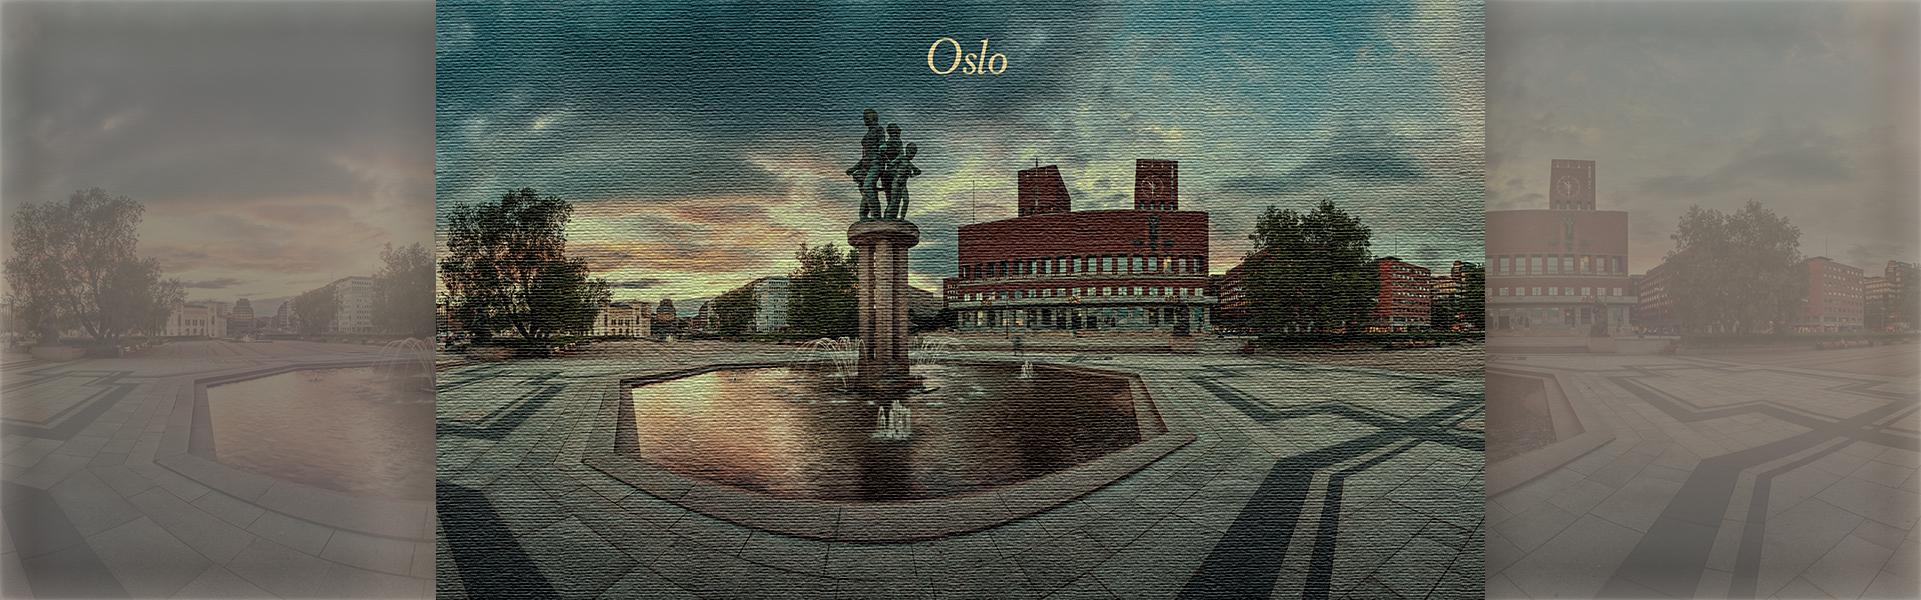 Oslo 7new слайдер 2